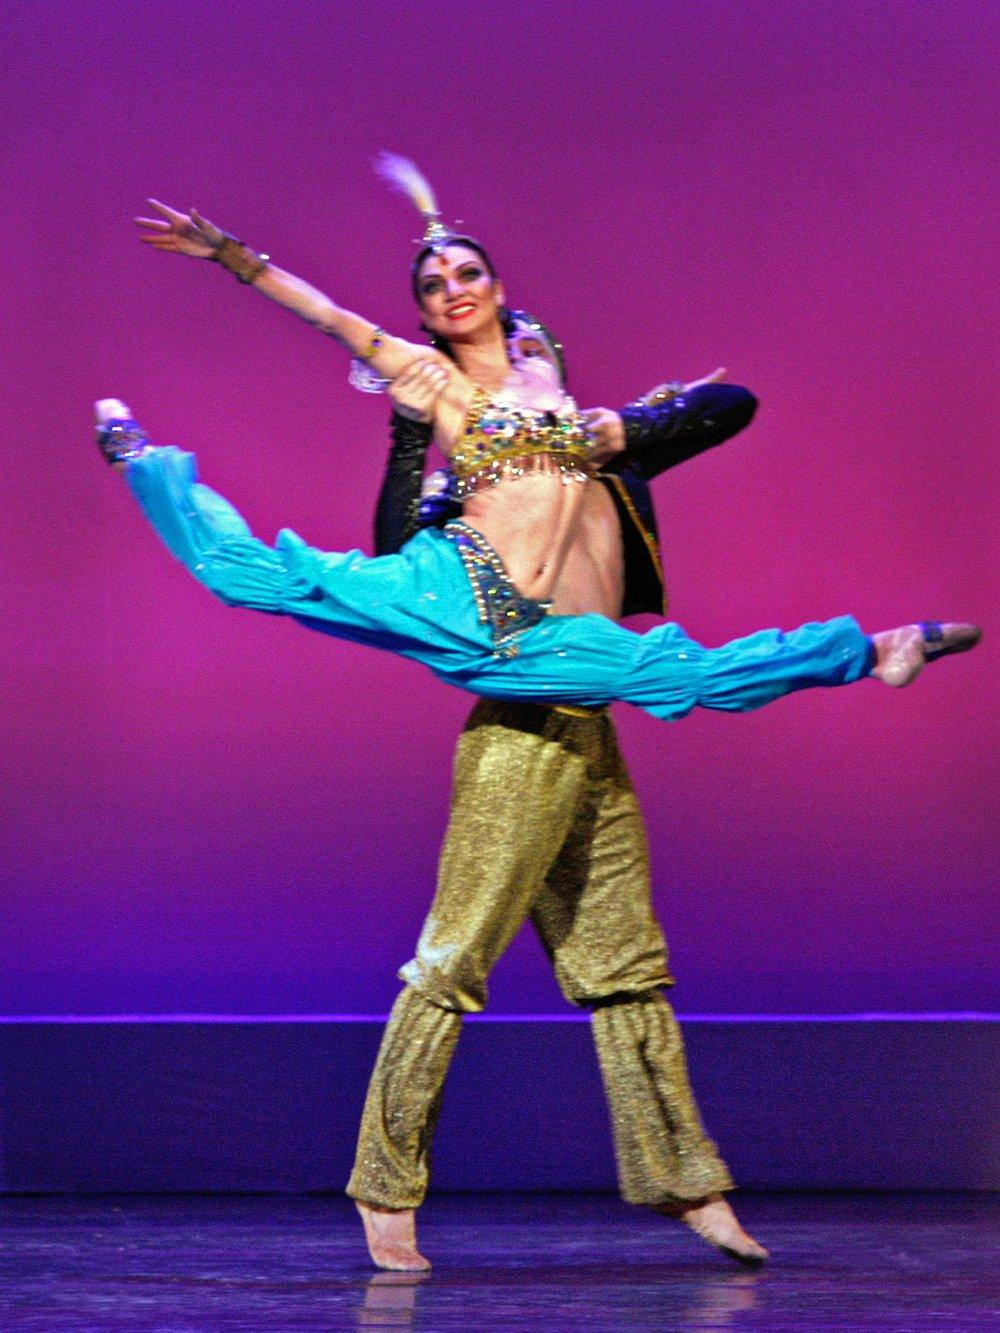 Julia Makhalina, Mariinsky Ballet & Mikhail Venshchikov, Makhailovsky Ballet